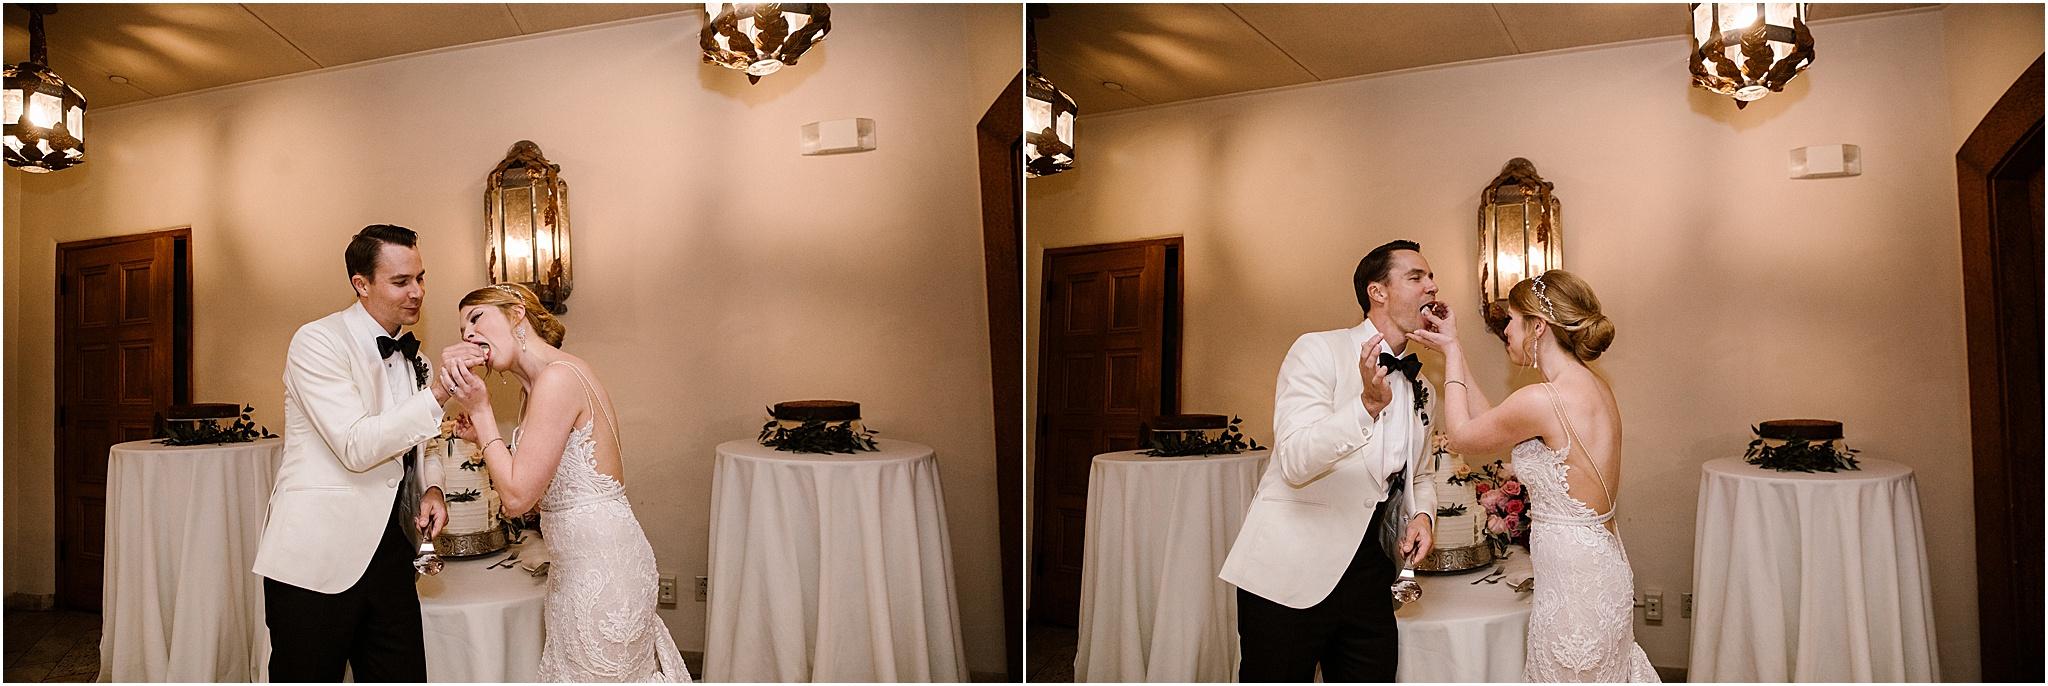 BLUE ROSE PHOTOGRAPHY SANTA FE WEDDING_60